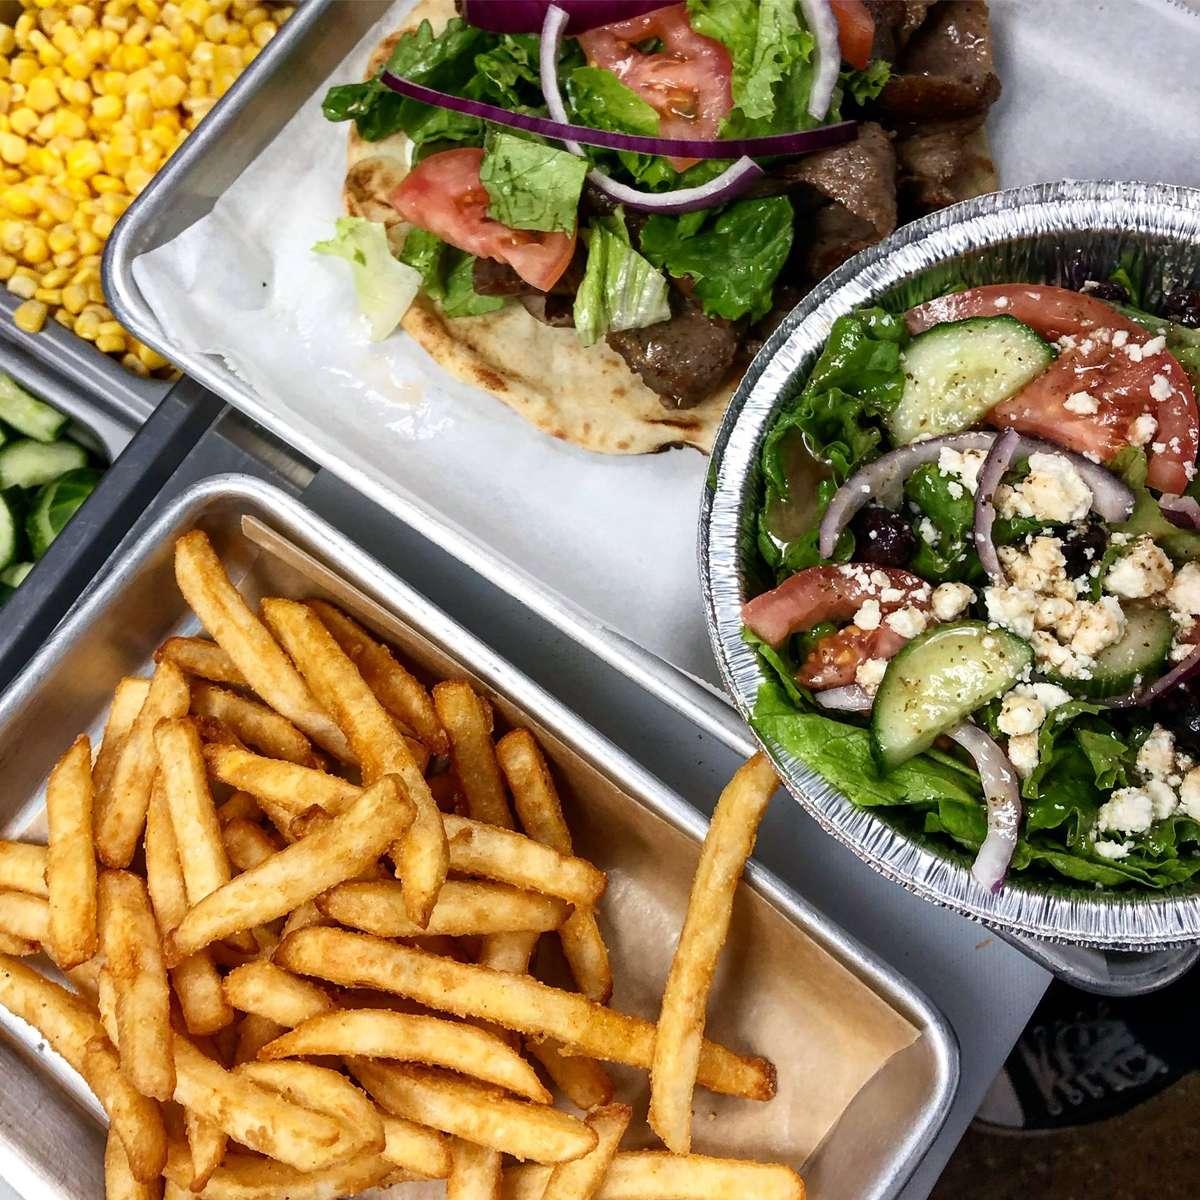 Greek salad and fries